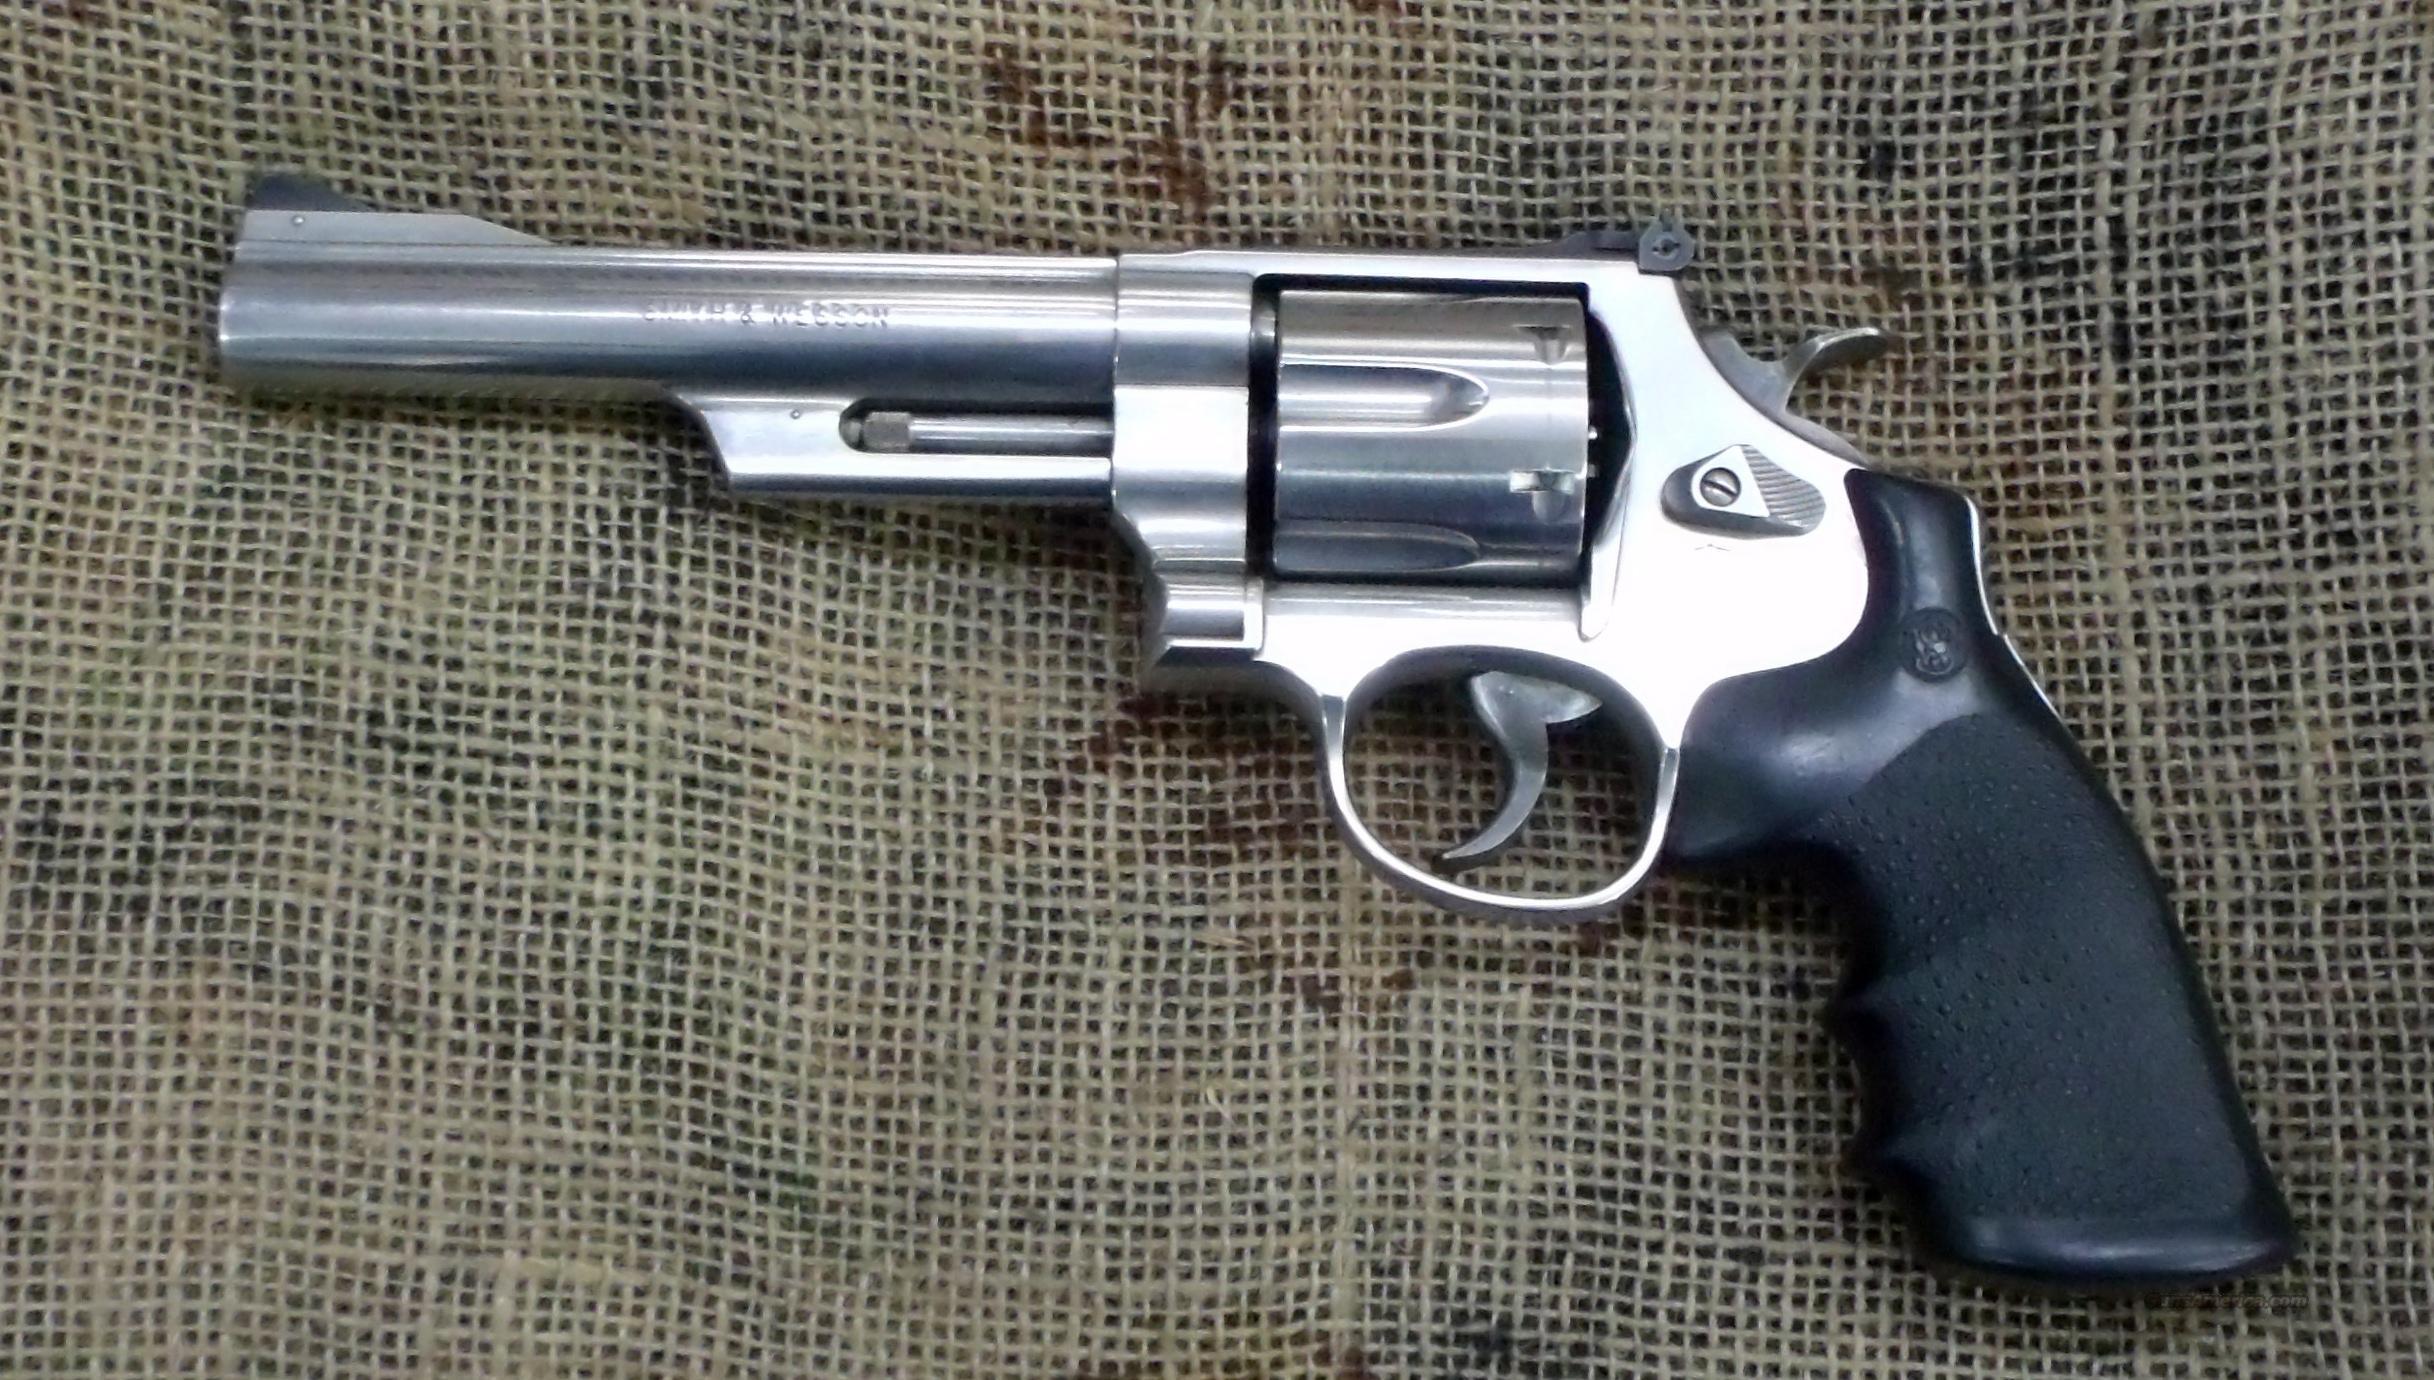 SMITH&WESSON Model 657-4 Rev., 41 Mag. Cal.   Guns > Pistols > Smith & Wesson Revolvers > Full Frame Revolver